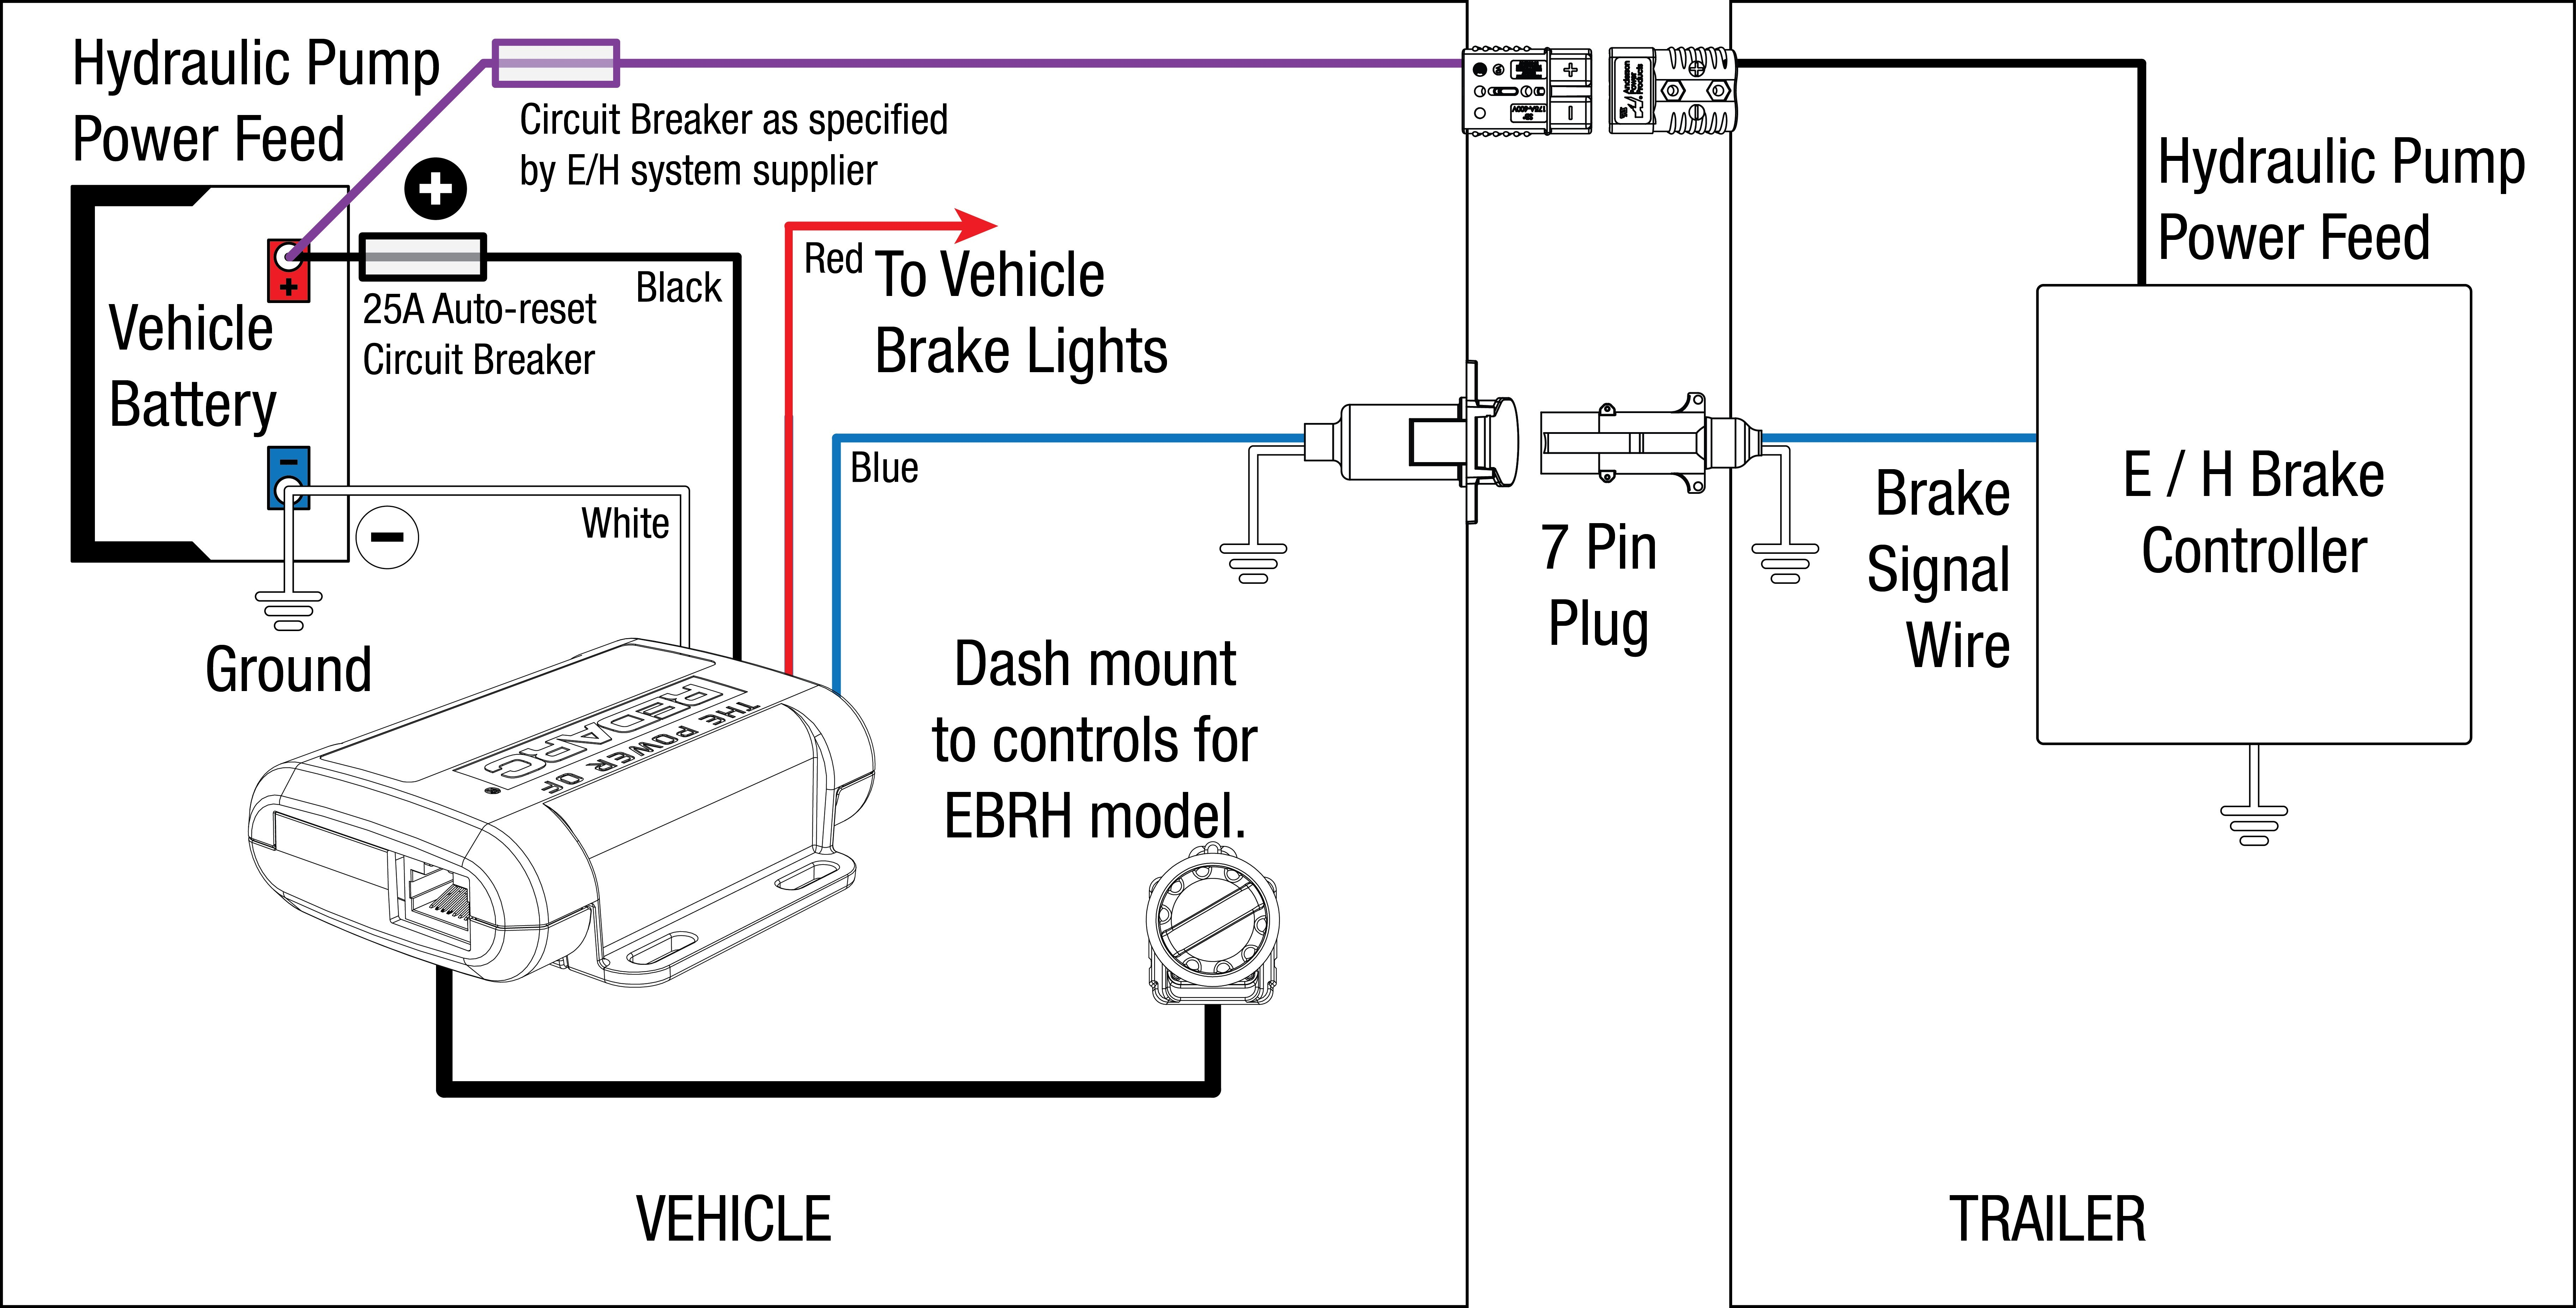 Trailer Light Wiring Diagram Luxury Tail Light Wiring Diagram Chevy Diagram Of Trailer Light Wiring Diagram